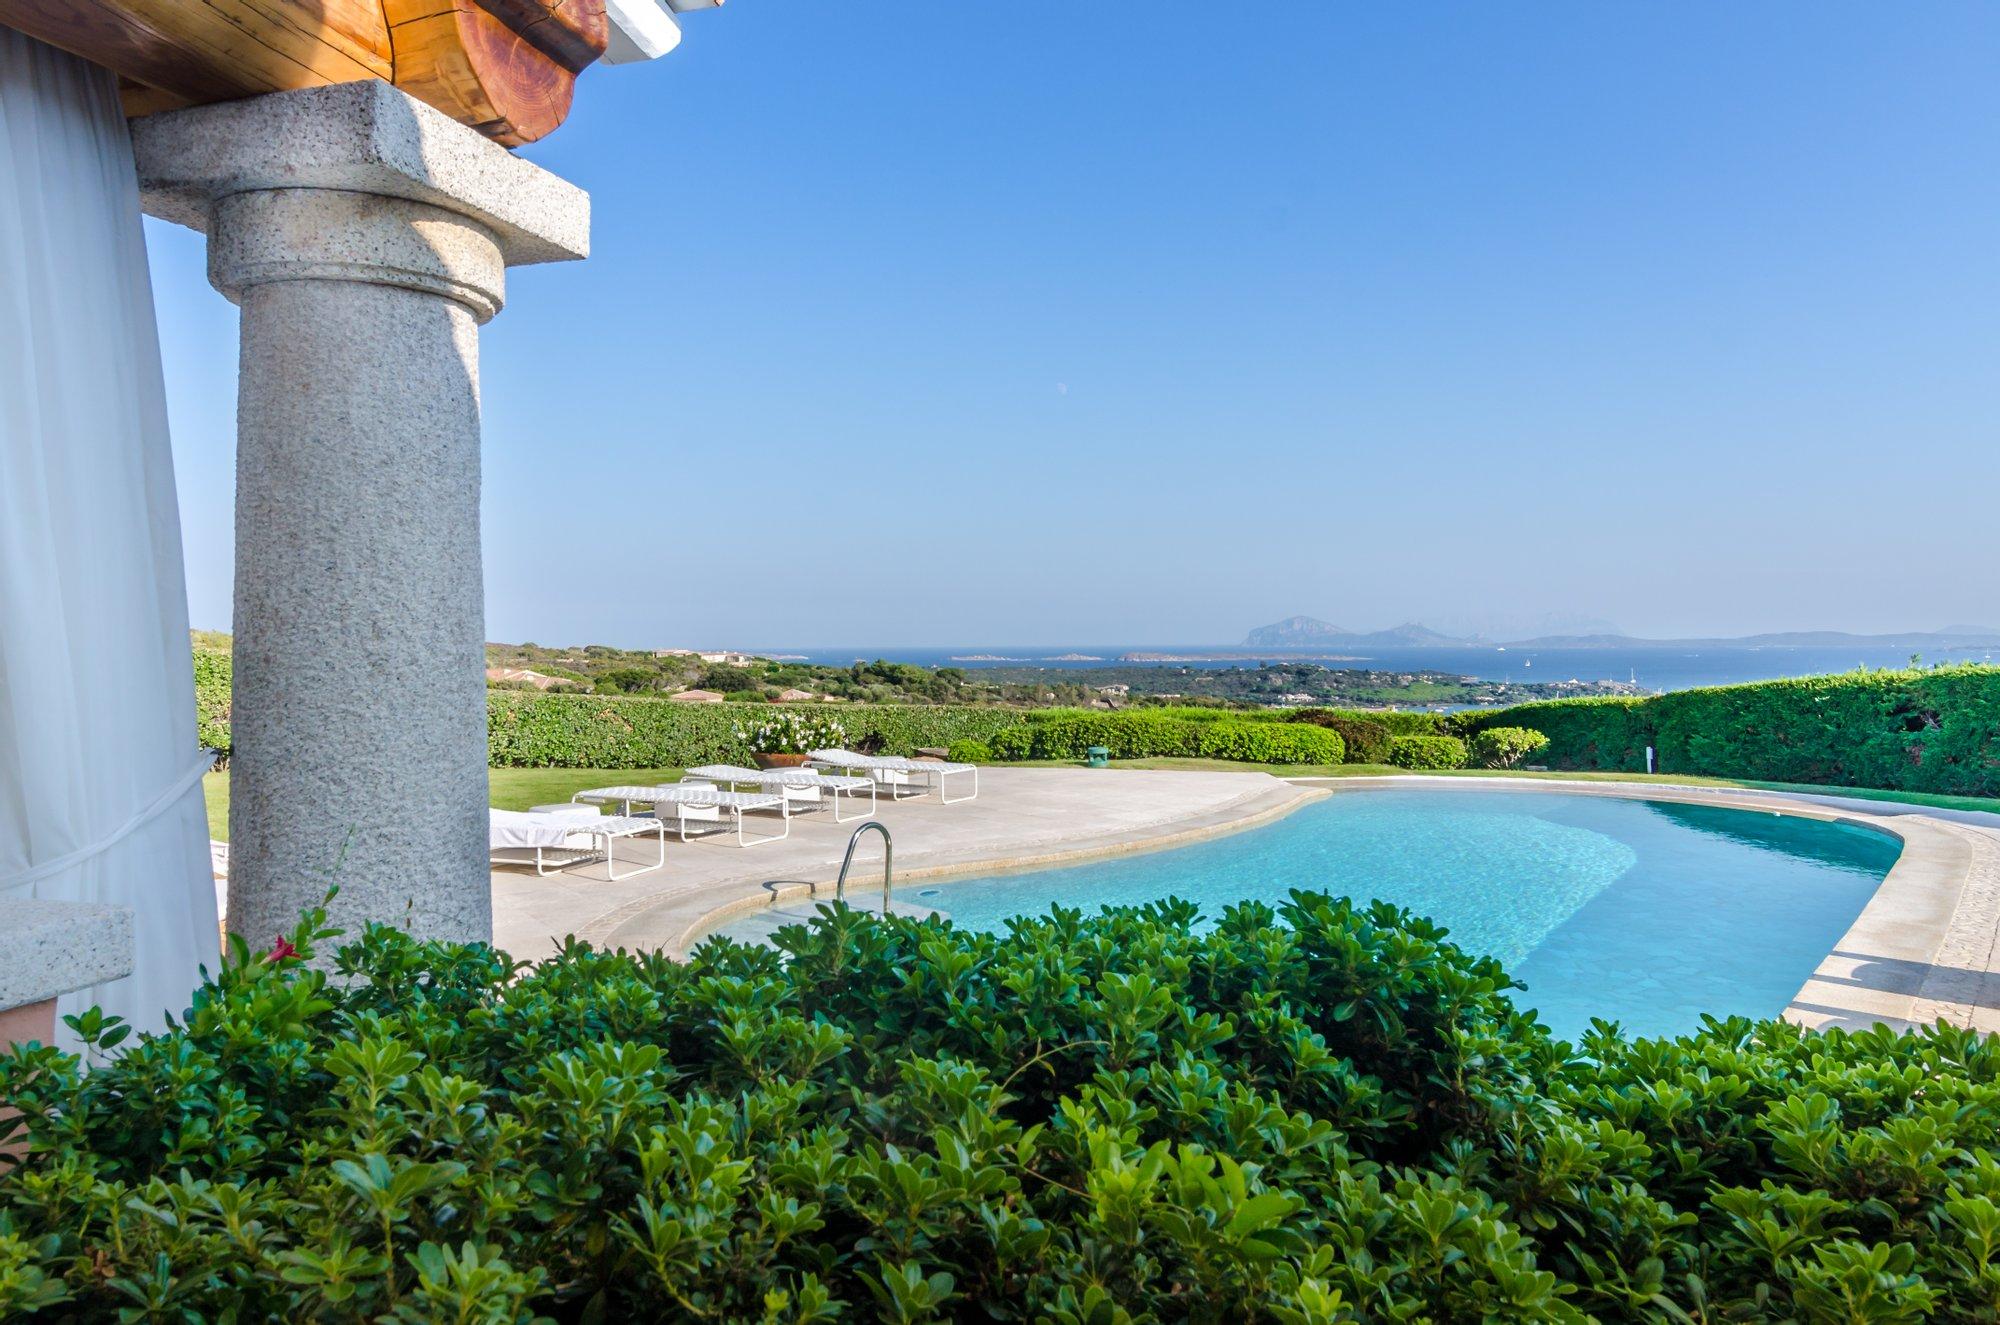 Villa in Cala di Volpe, Sardinia, Italy 1 - 11435281